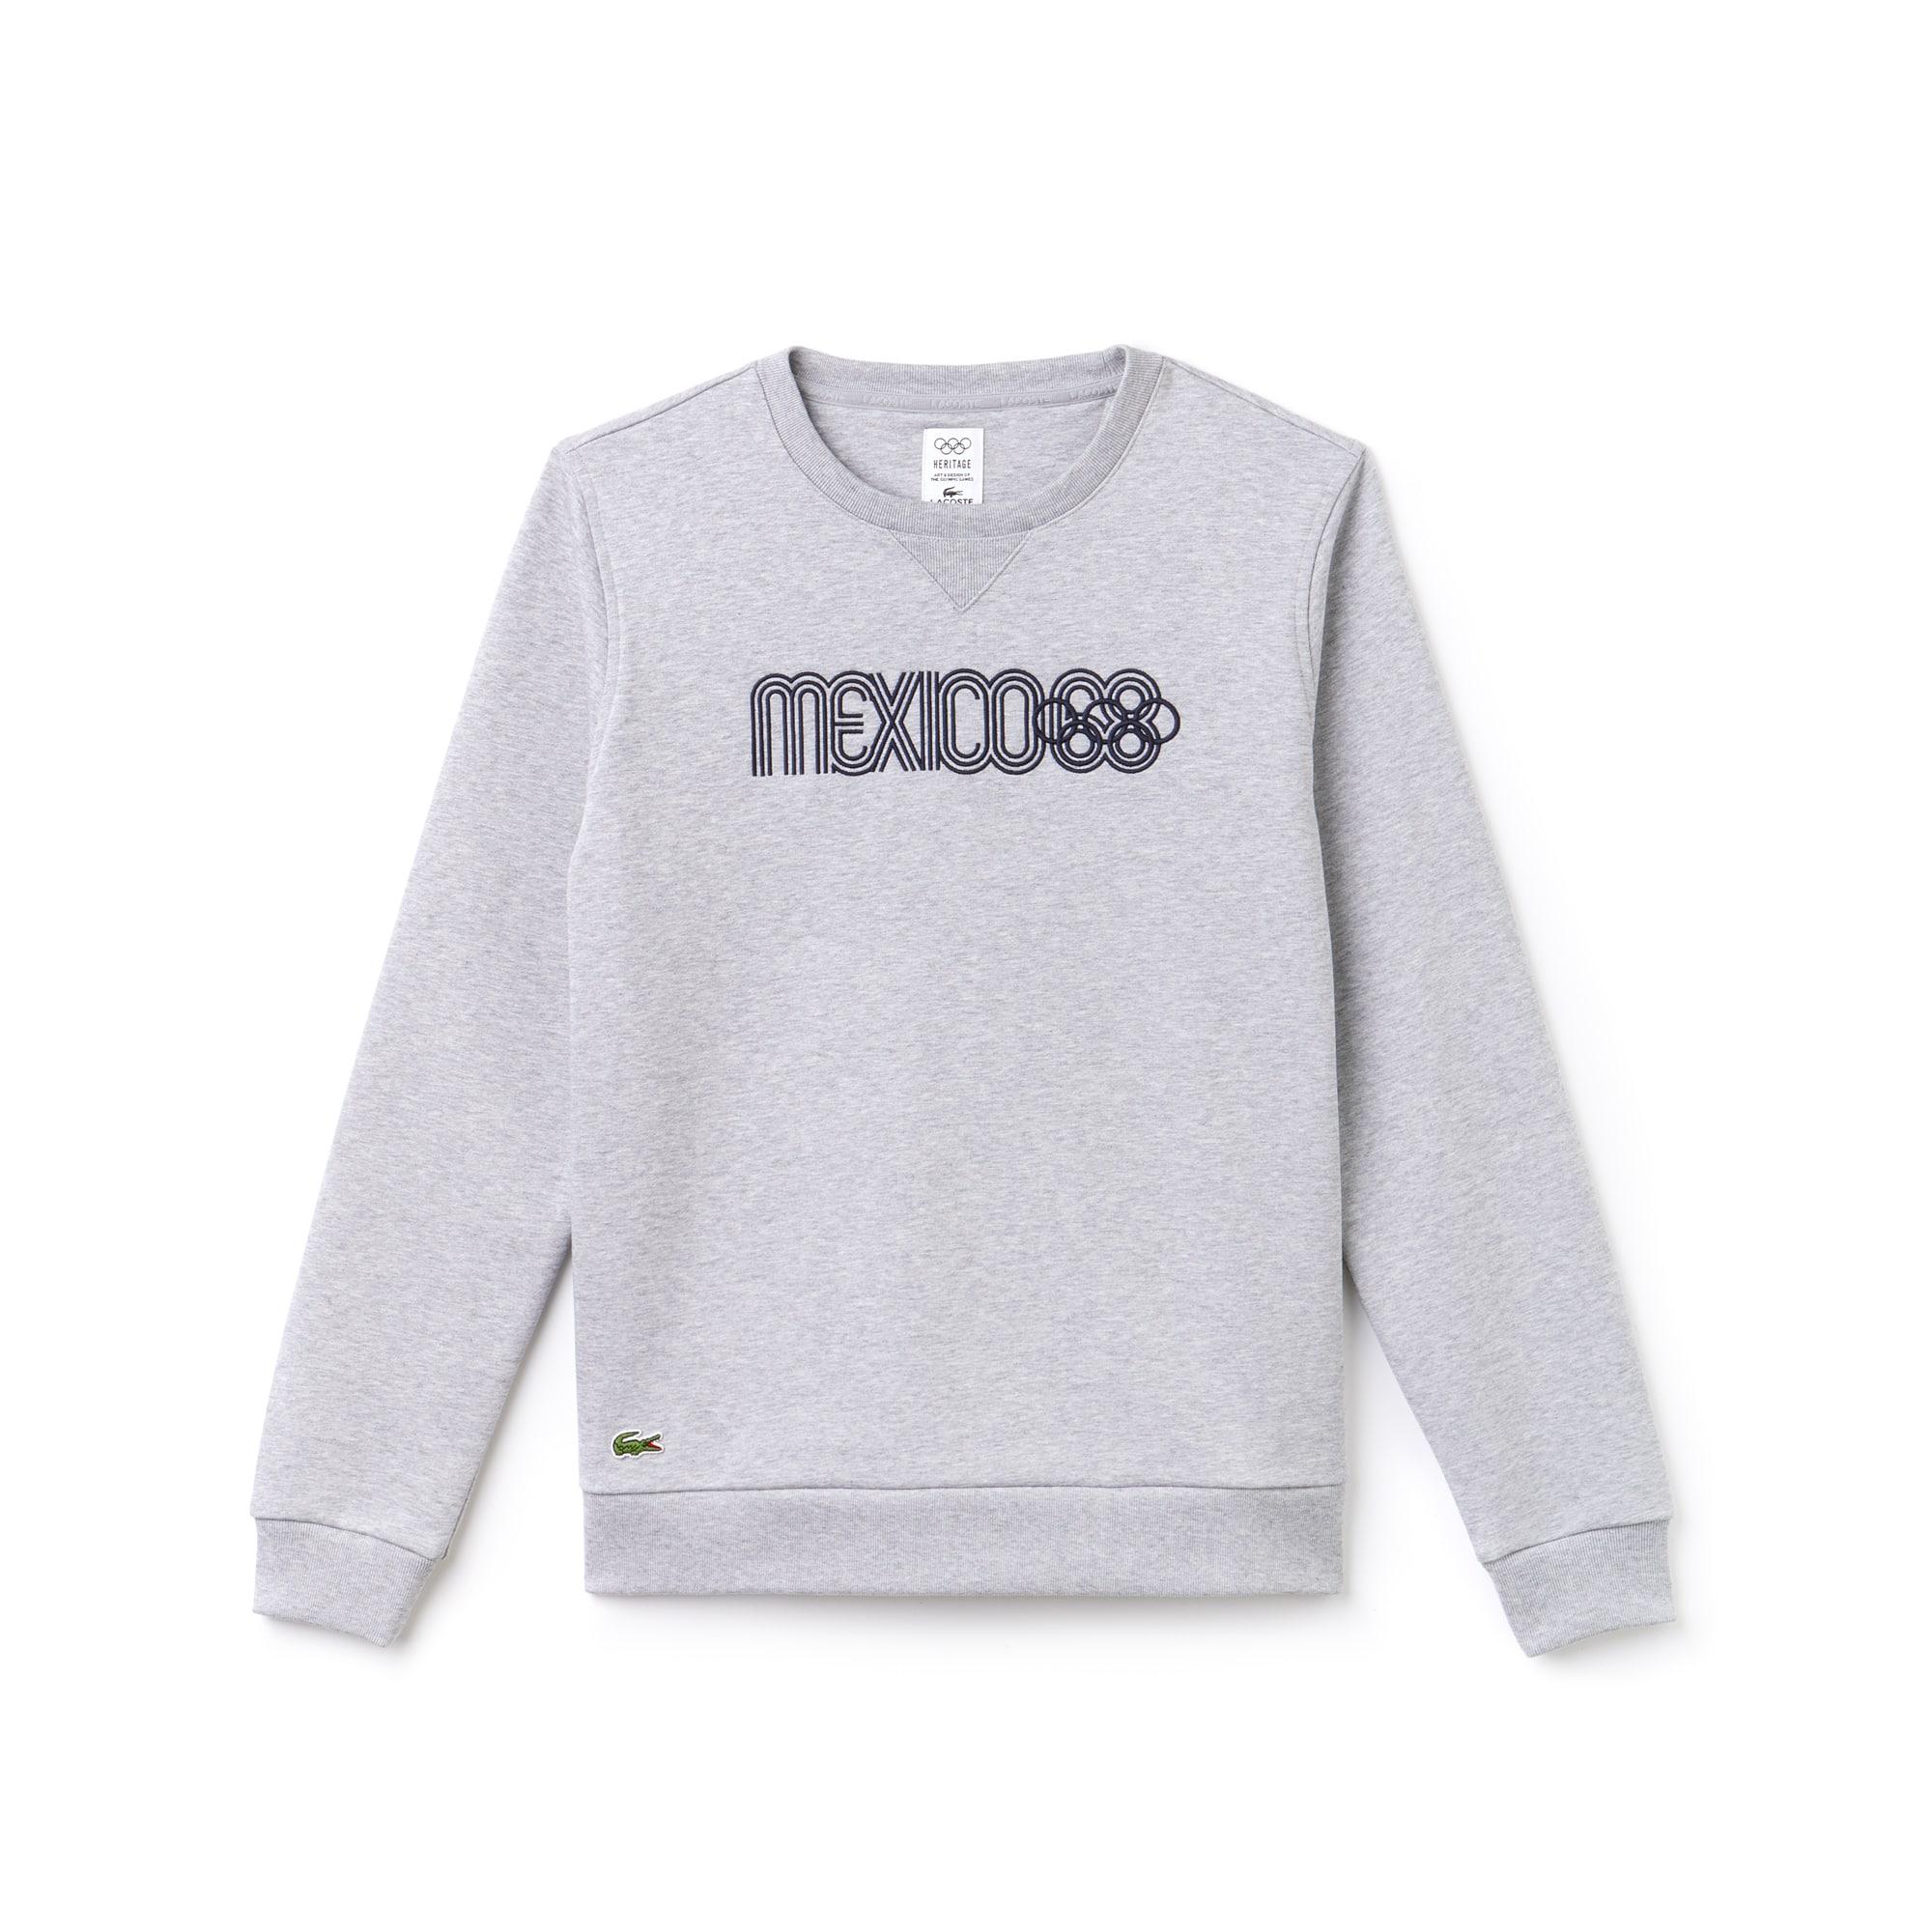 Men's SPORT Mexico Héritage 1968 Embroidered Fleece Sweatshirt